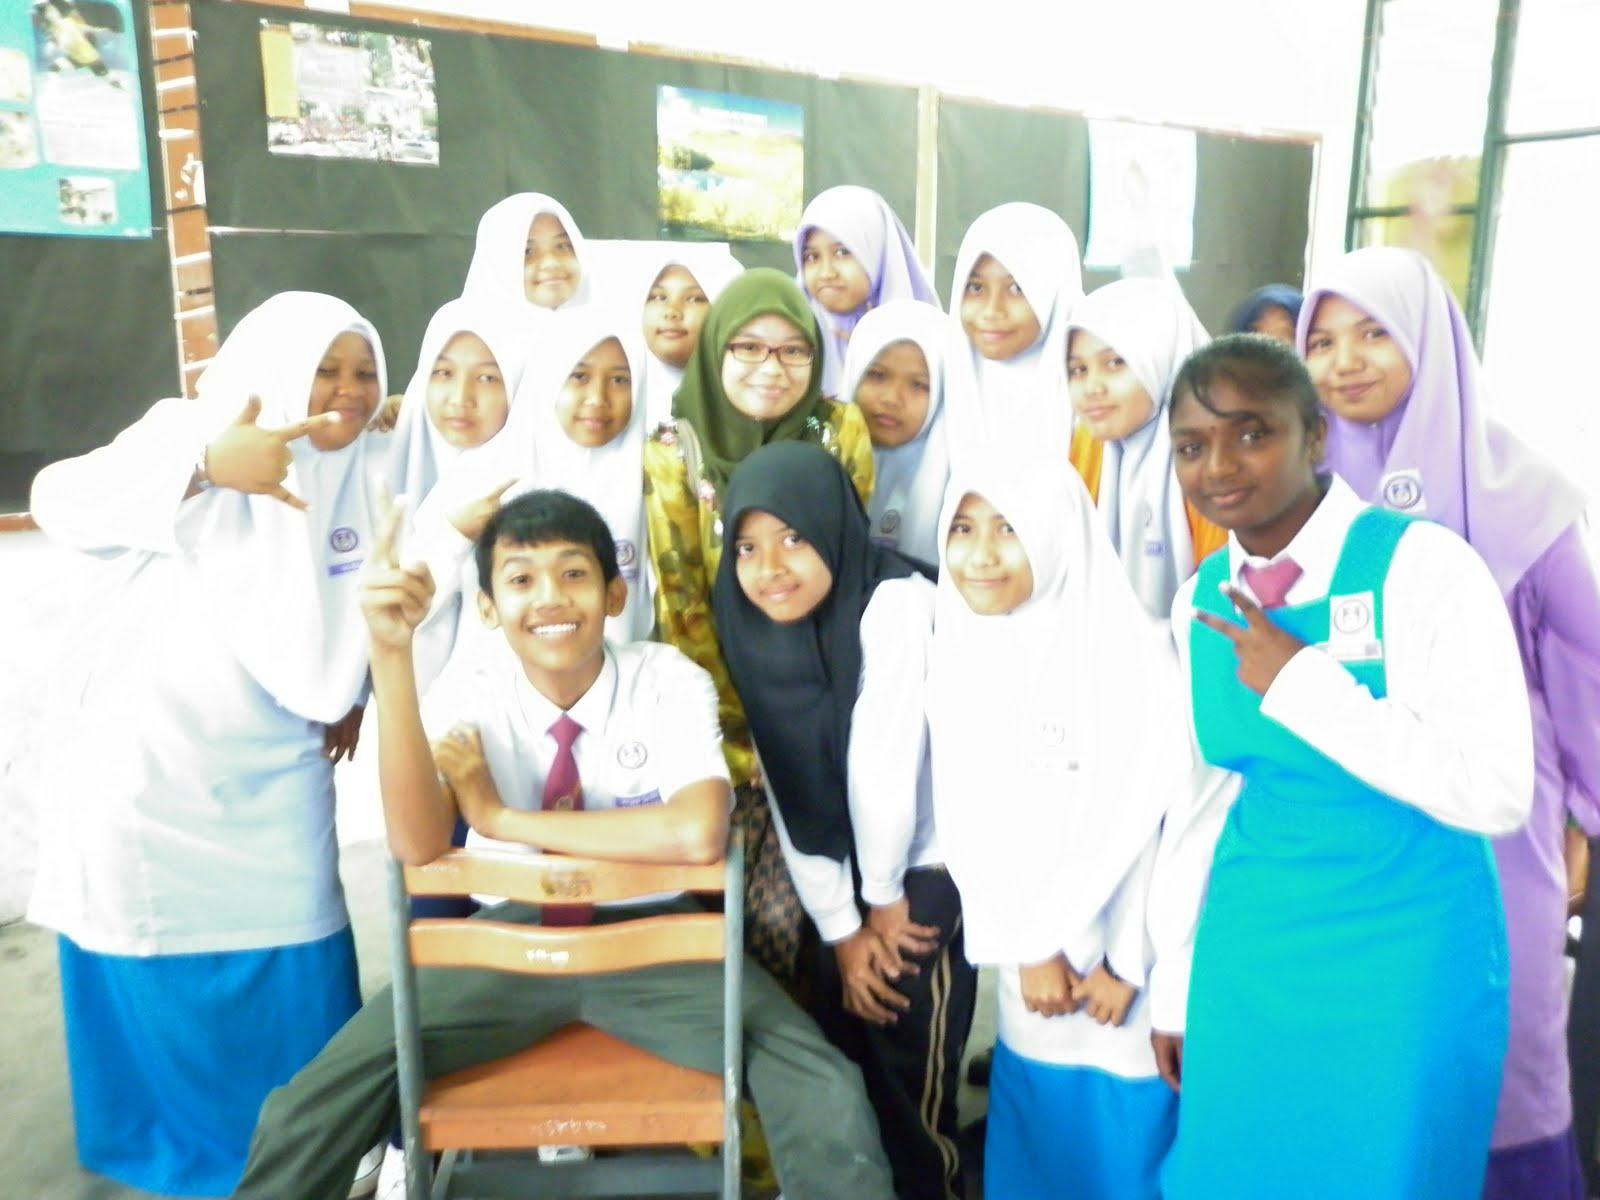 Geng budak sekolah malay - 3 9